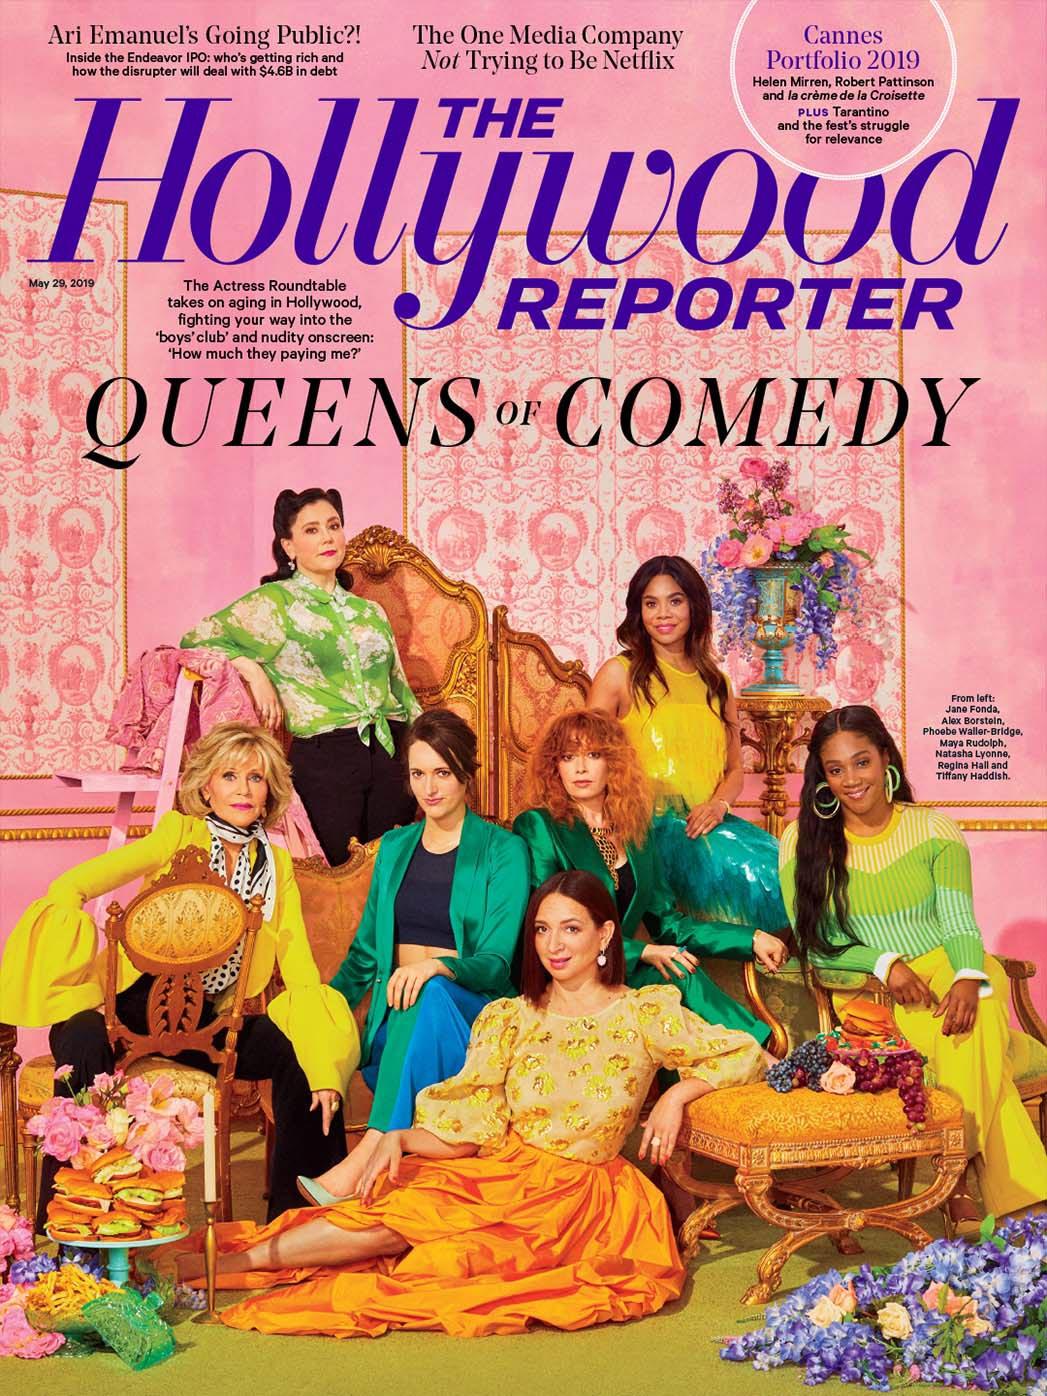 THR x Hollywood Roundtable